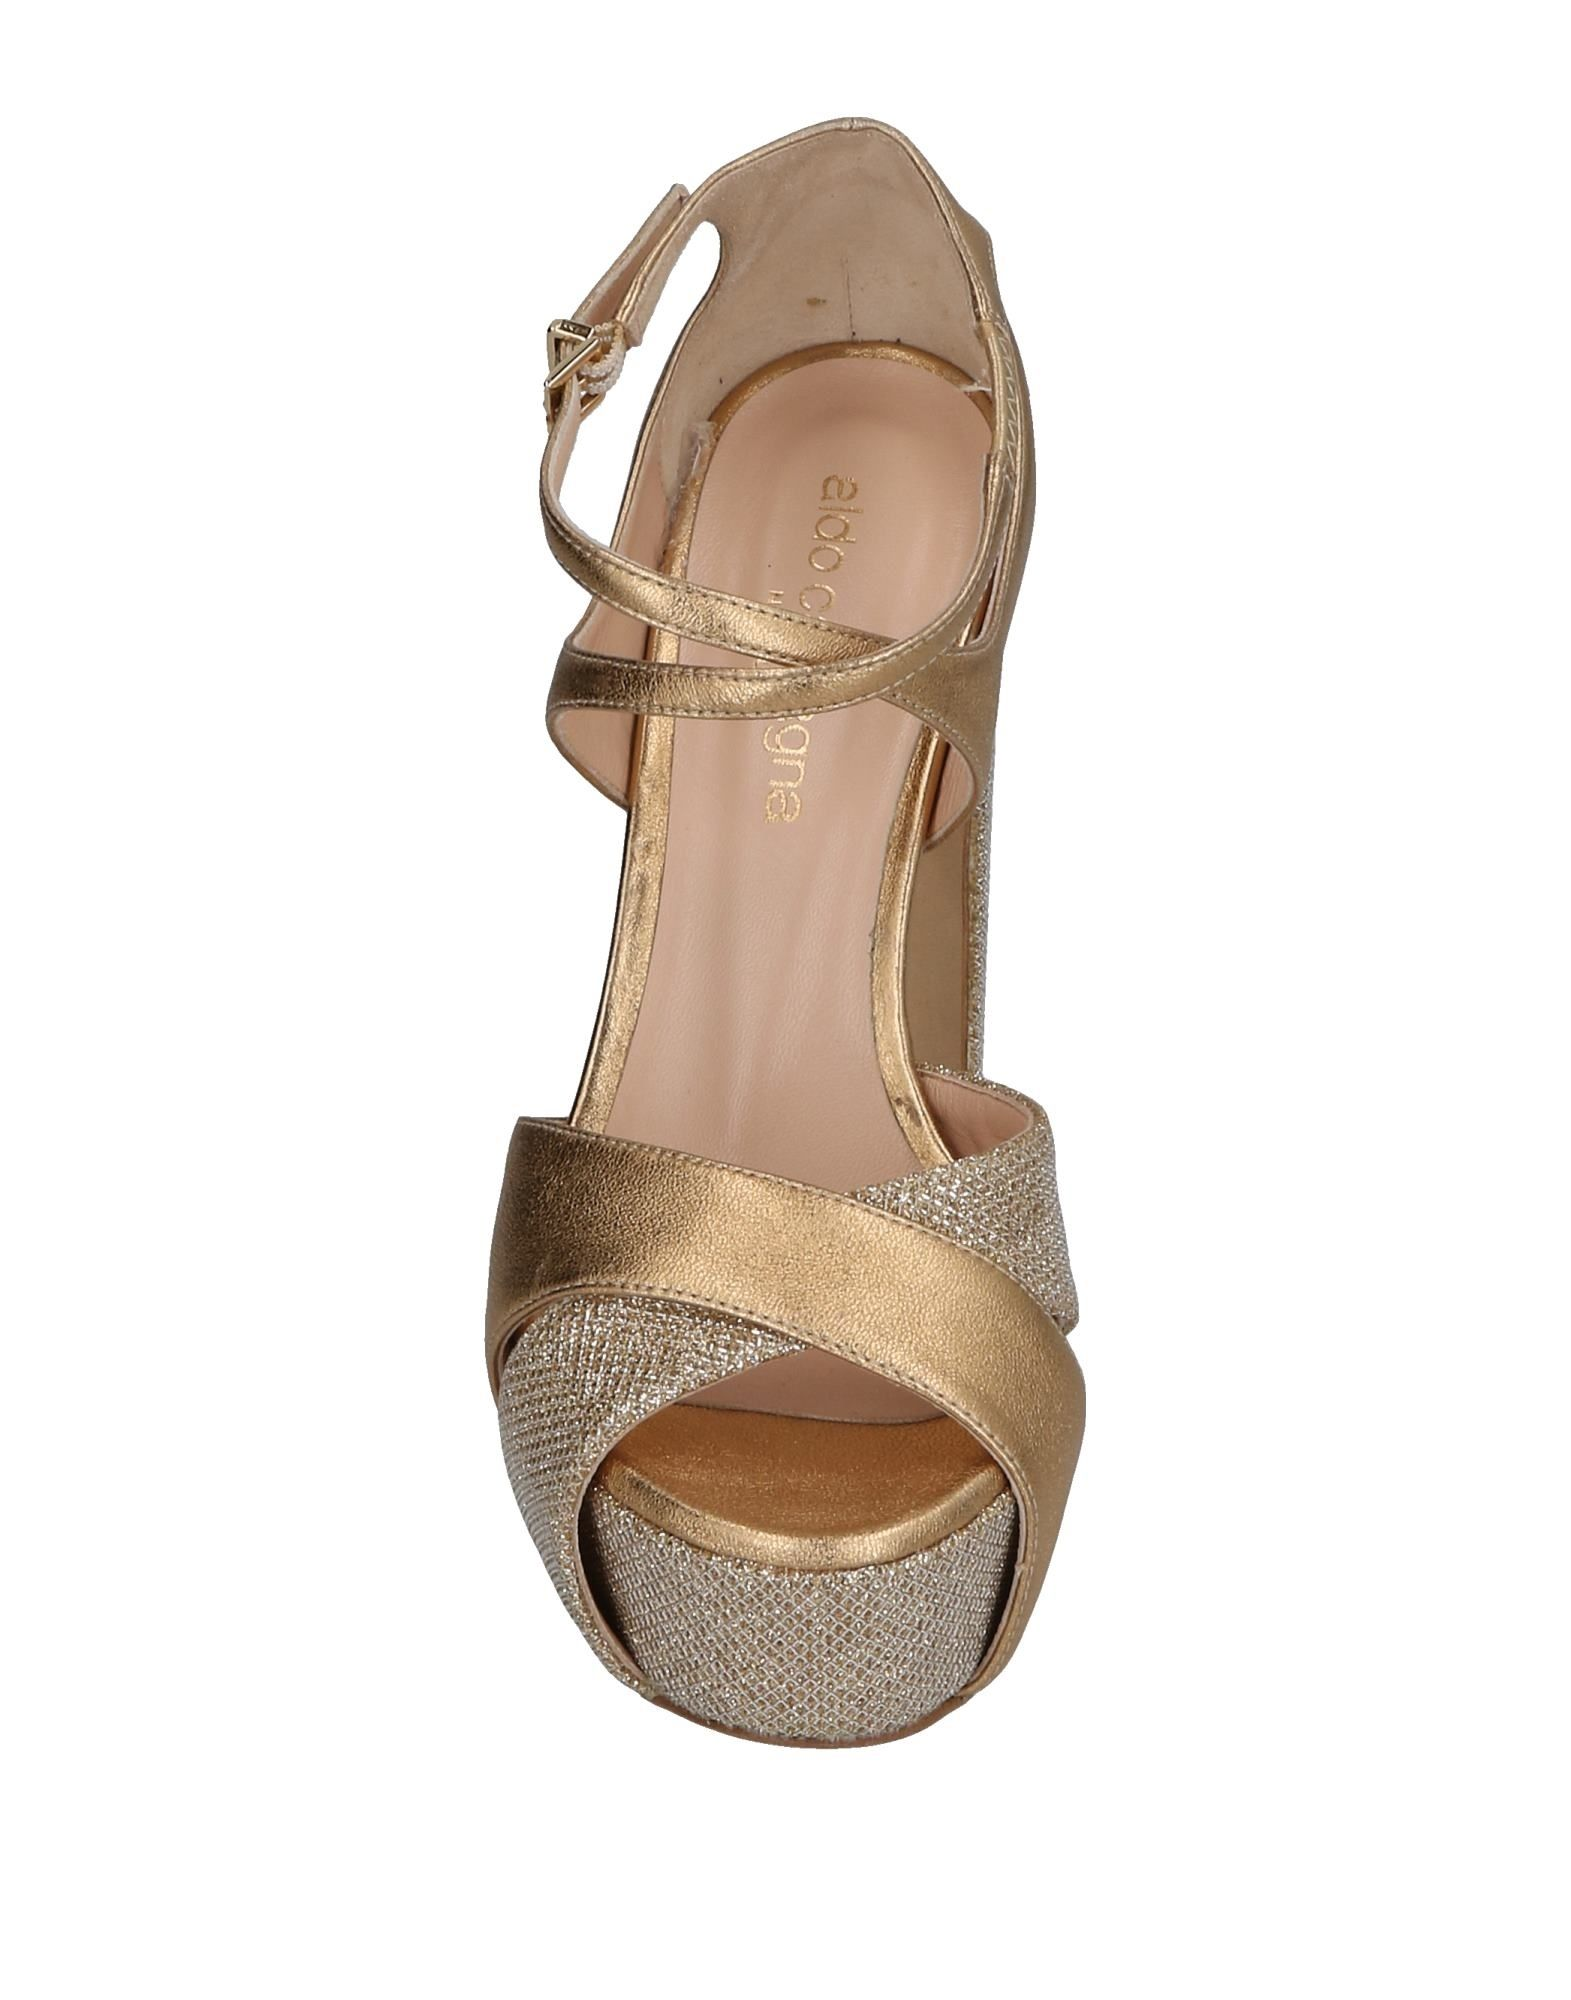 Chaussures - Tribunaux Benedetta Boroli XVGkxuKvp9